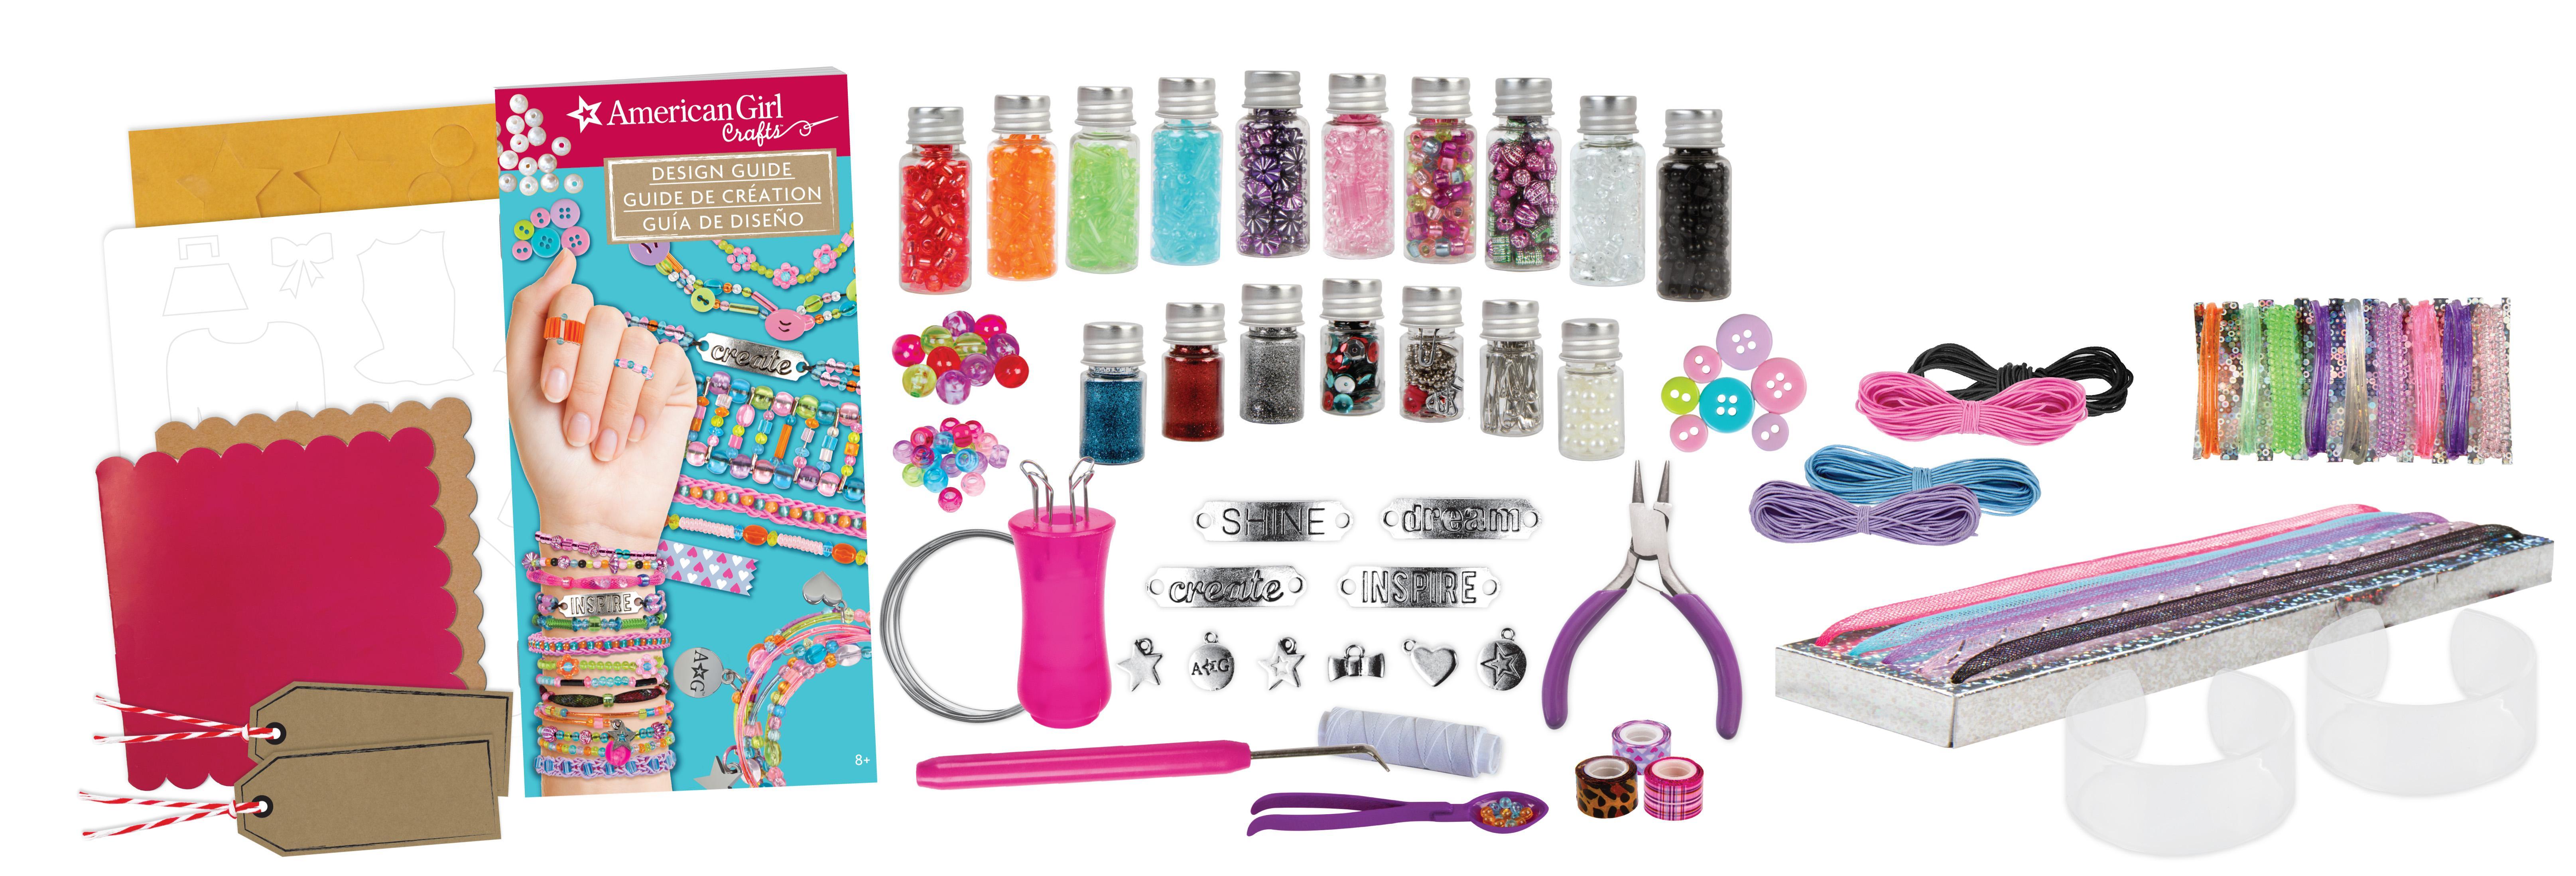 American girl 24118 ultimate crafting super set jewellery for American girl ultimate crafting super set